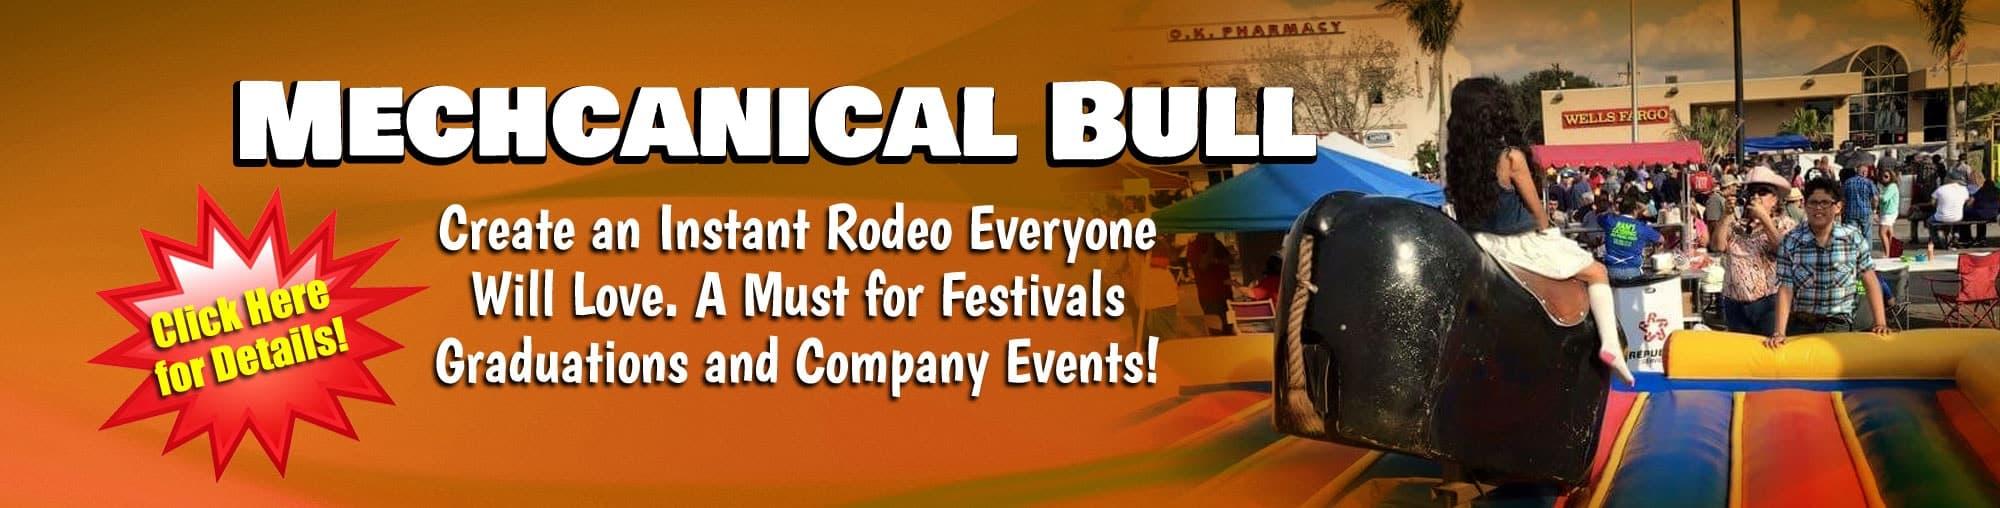 Mechcanical Bull Rental